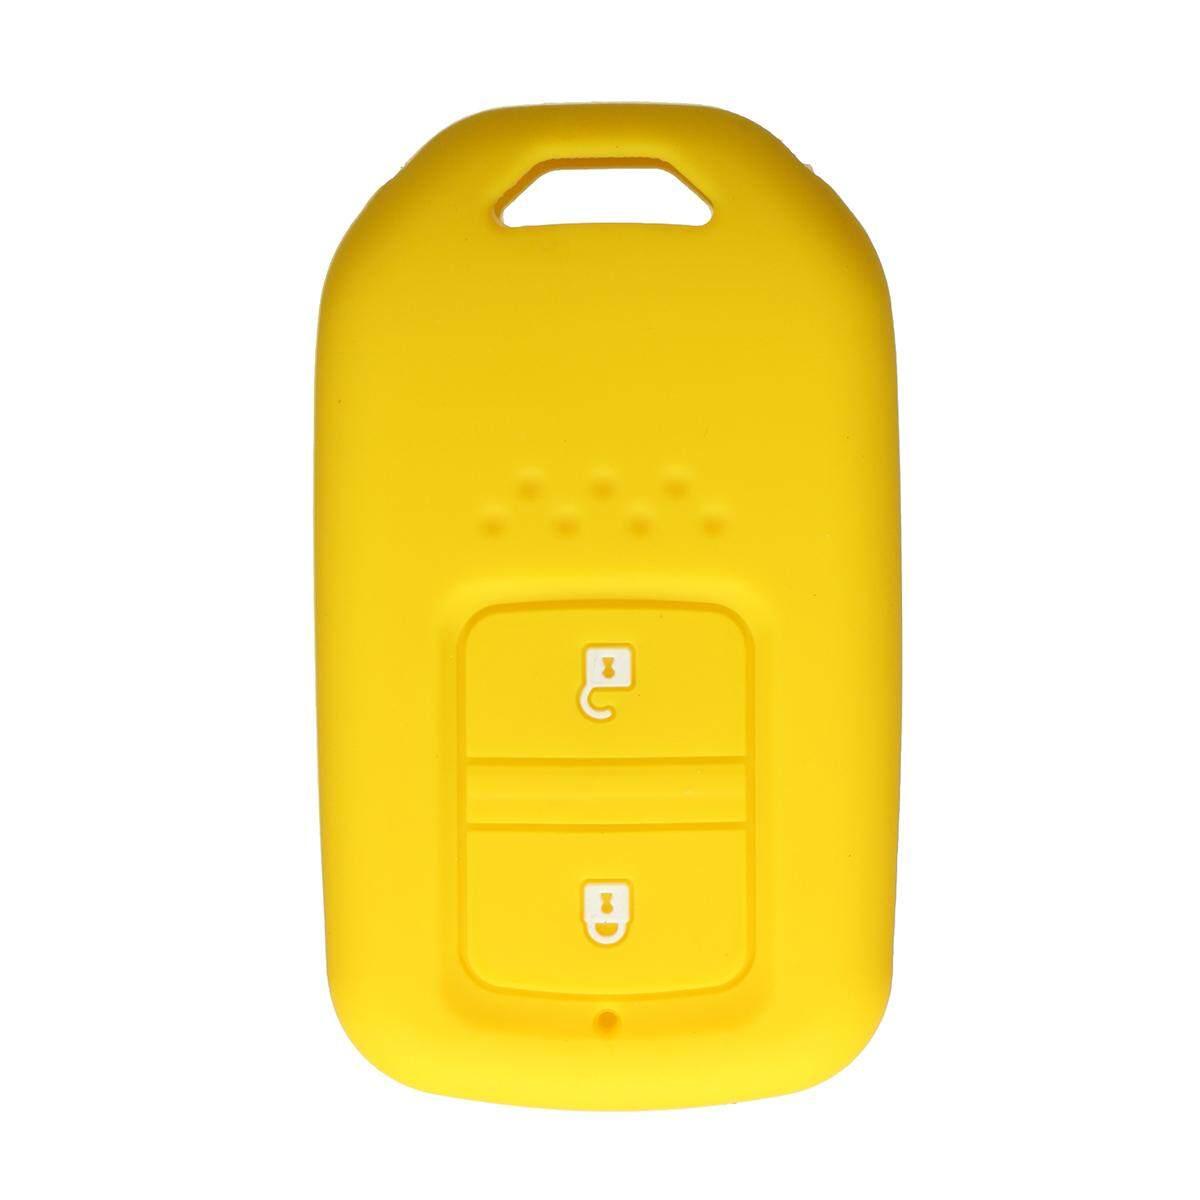 Rp 50000 2 Tombol Pintar Silikon Sarung Kunci Fob Kulit Cocok Untuk Honda Giok VEZEL HRV Crider Kuning InternasionalIDR50000